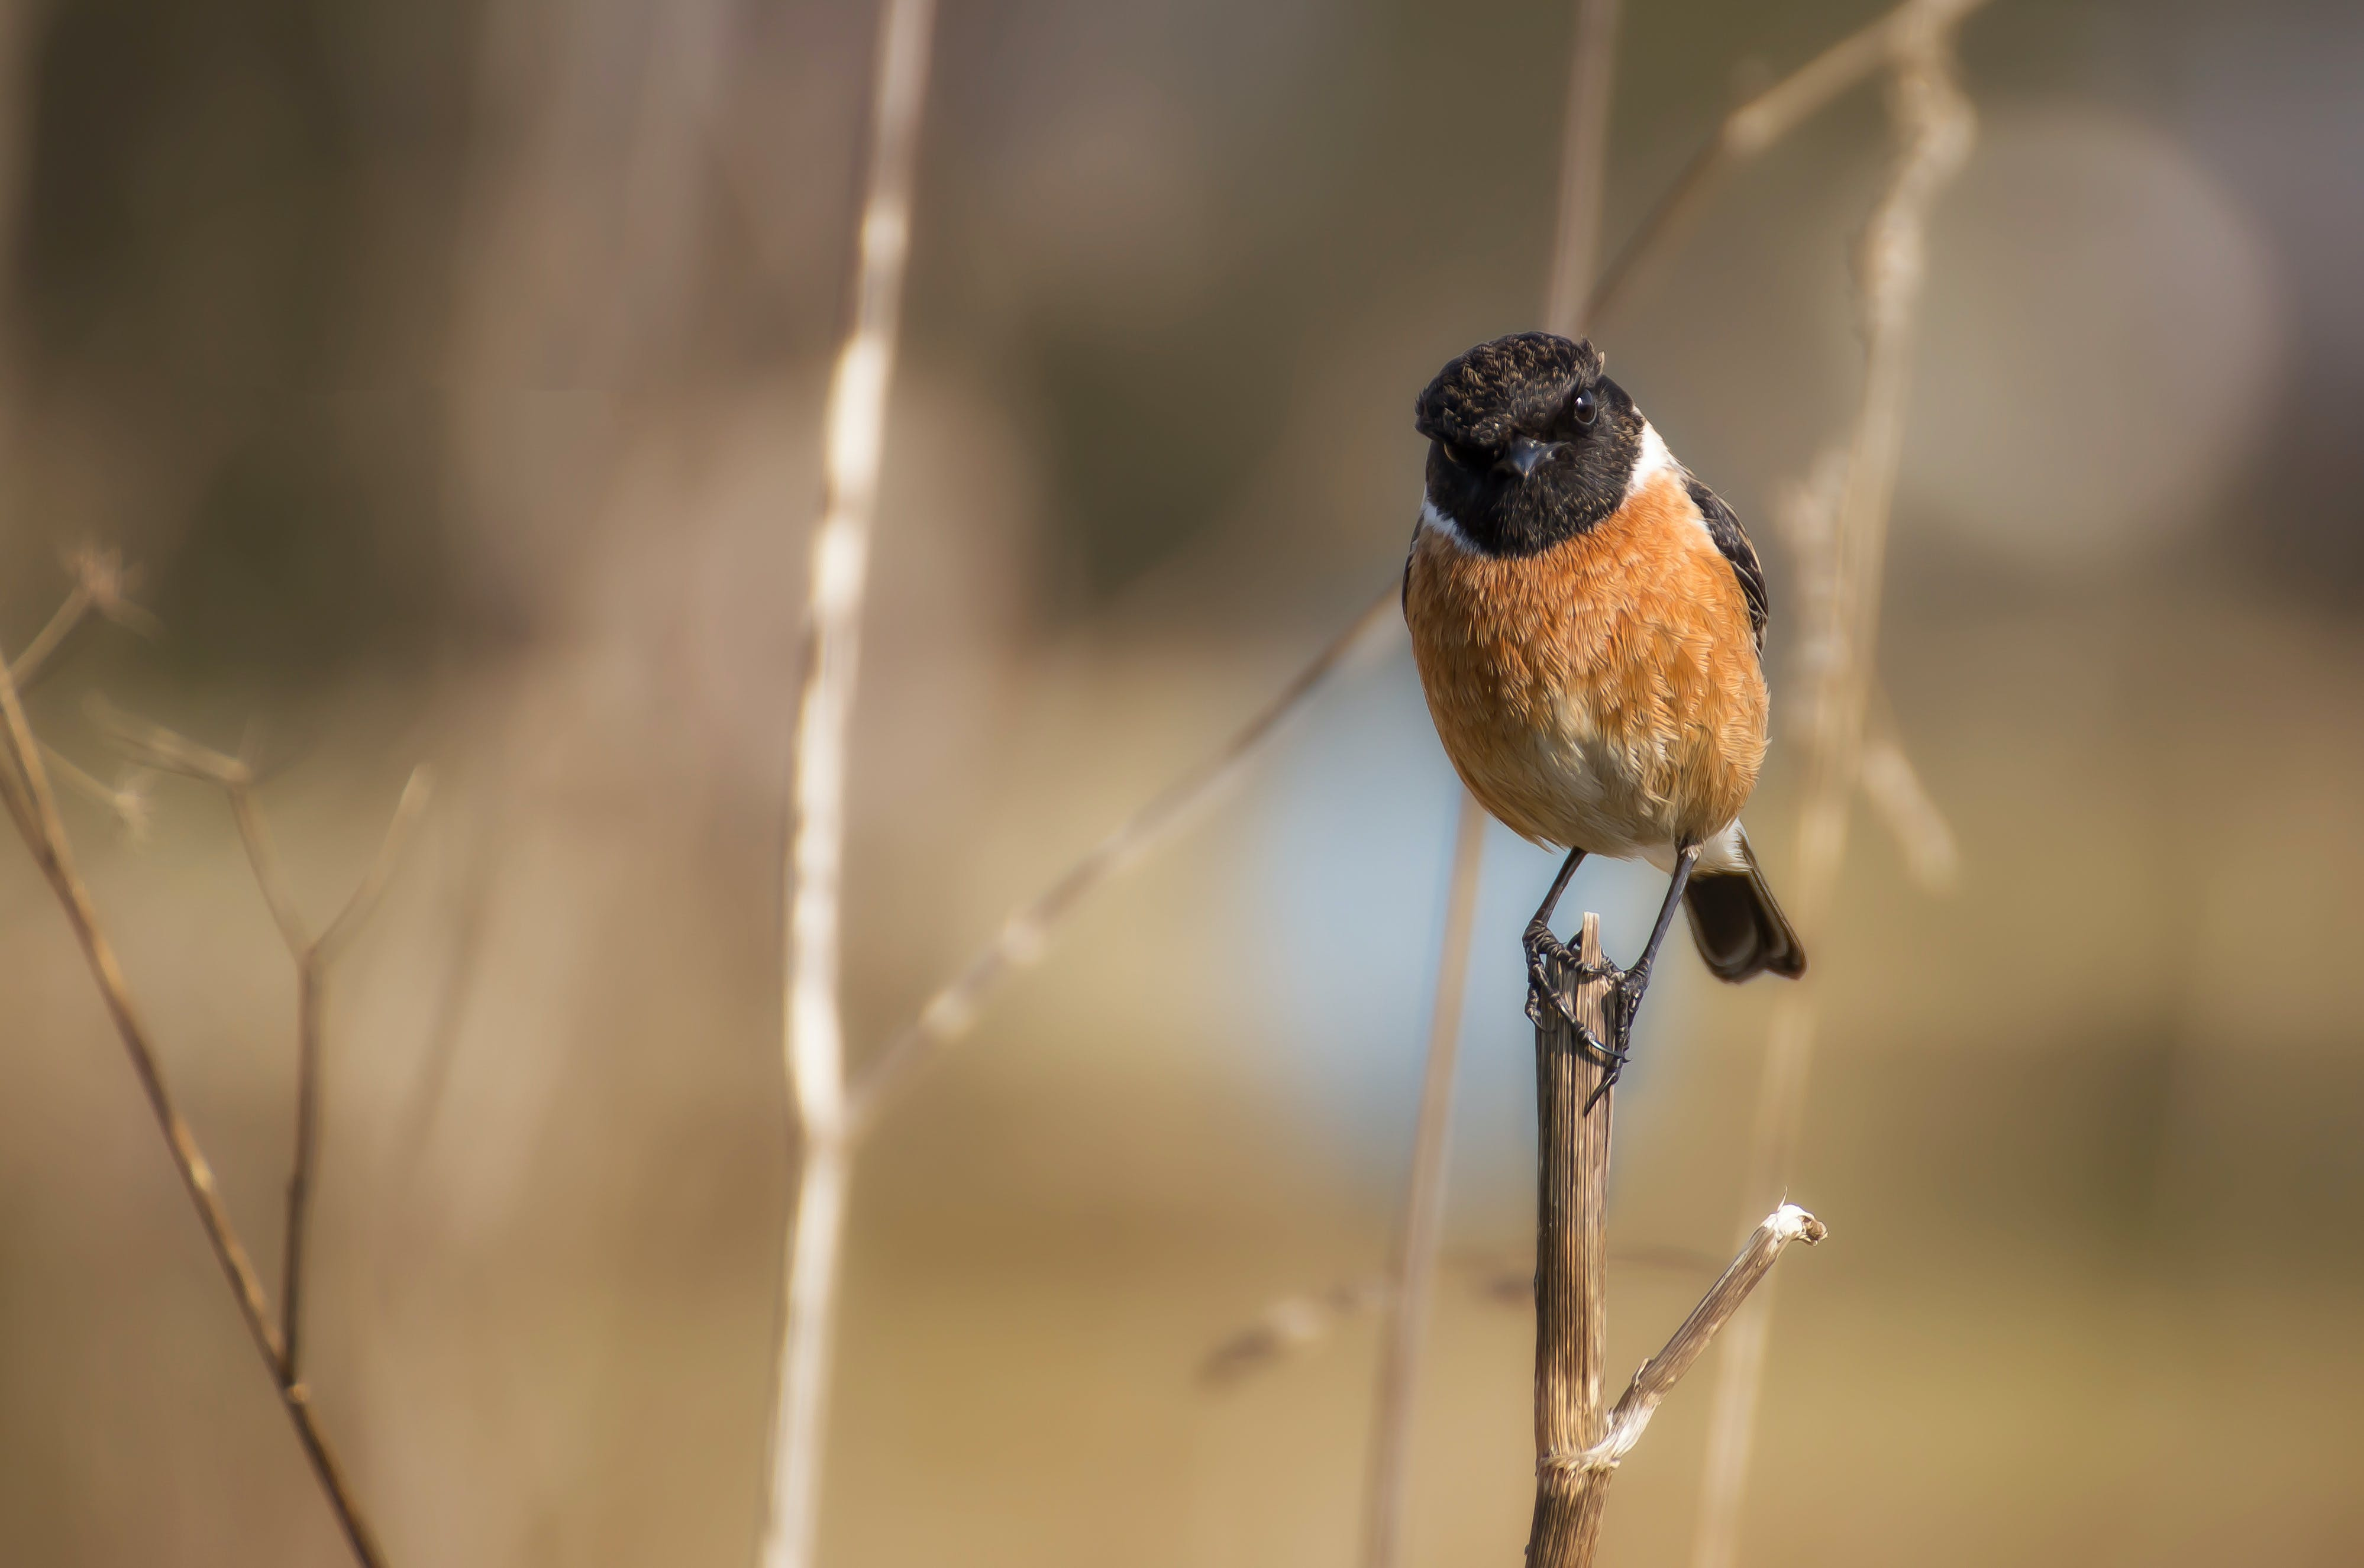 Brown Black Bird on Twig during Daytime